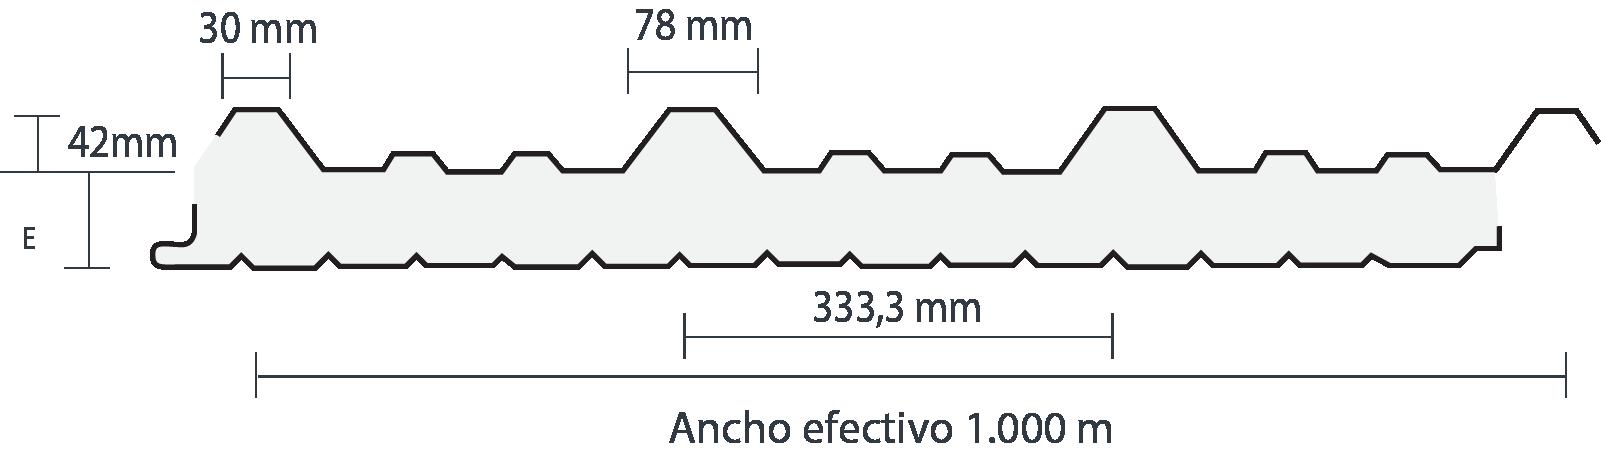 medidas-glamet-a42-max-acero